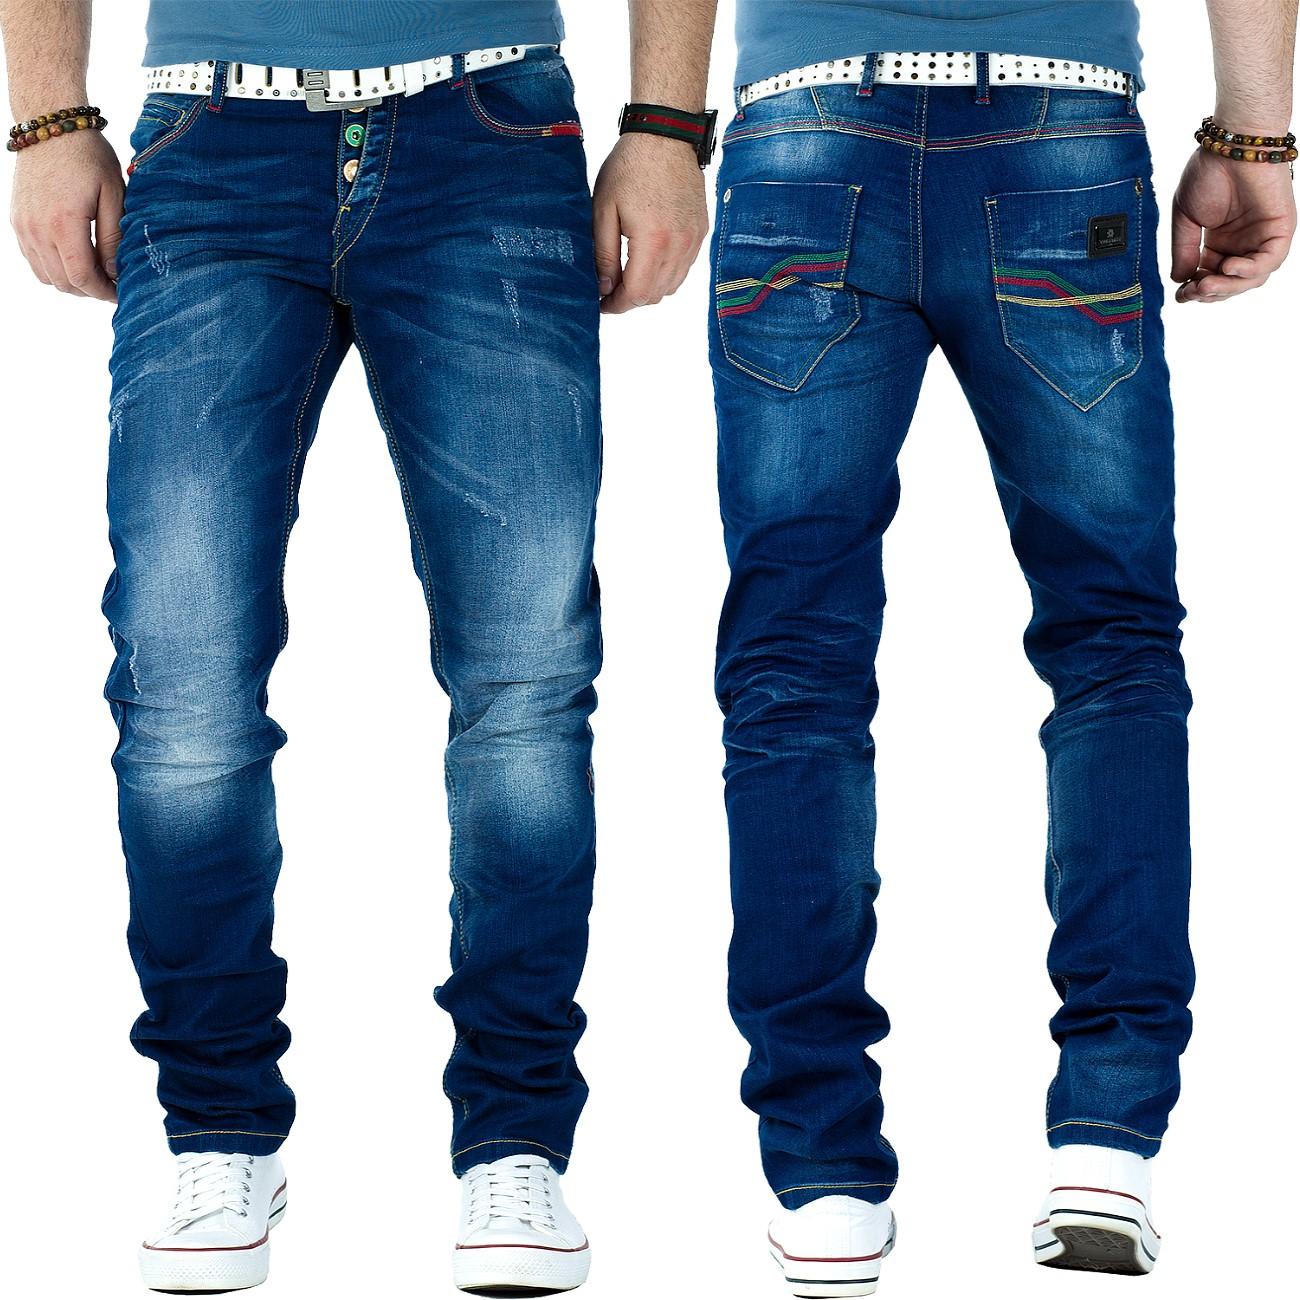 cipo baxx herren regular slim fit jeans hosen streetwear. Black Bedroom Furniture Sets. Home Design Ideas